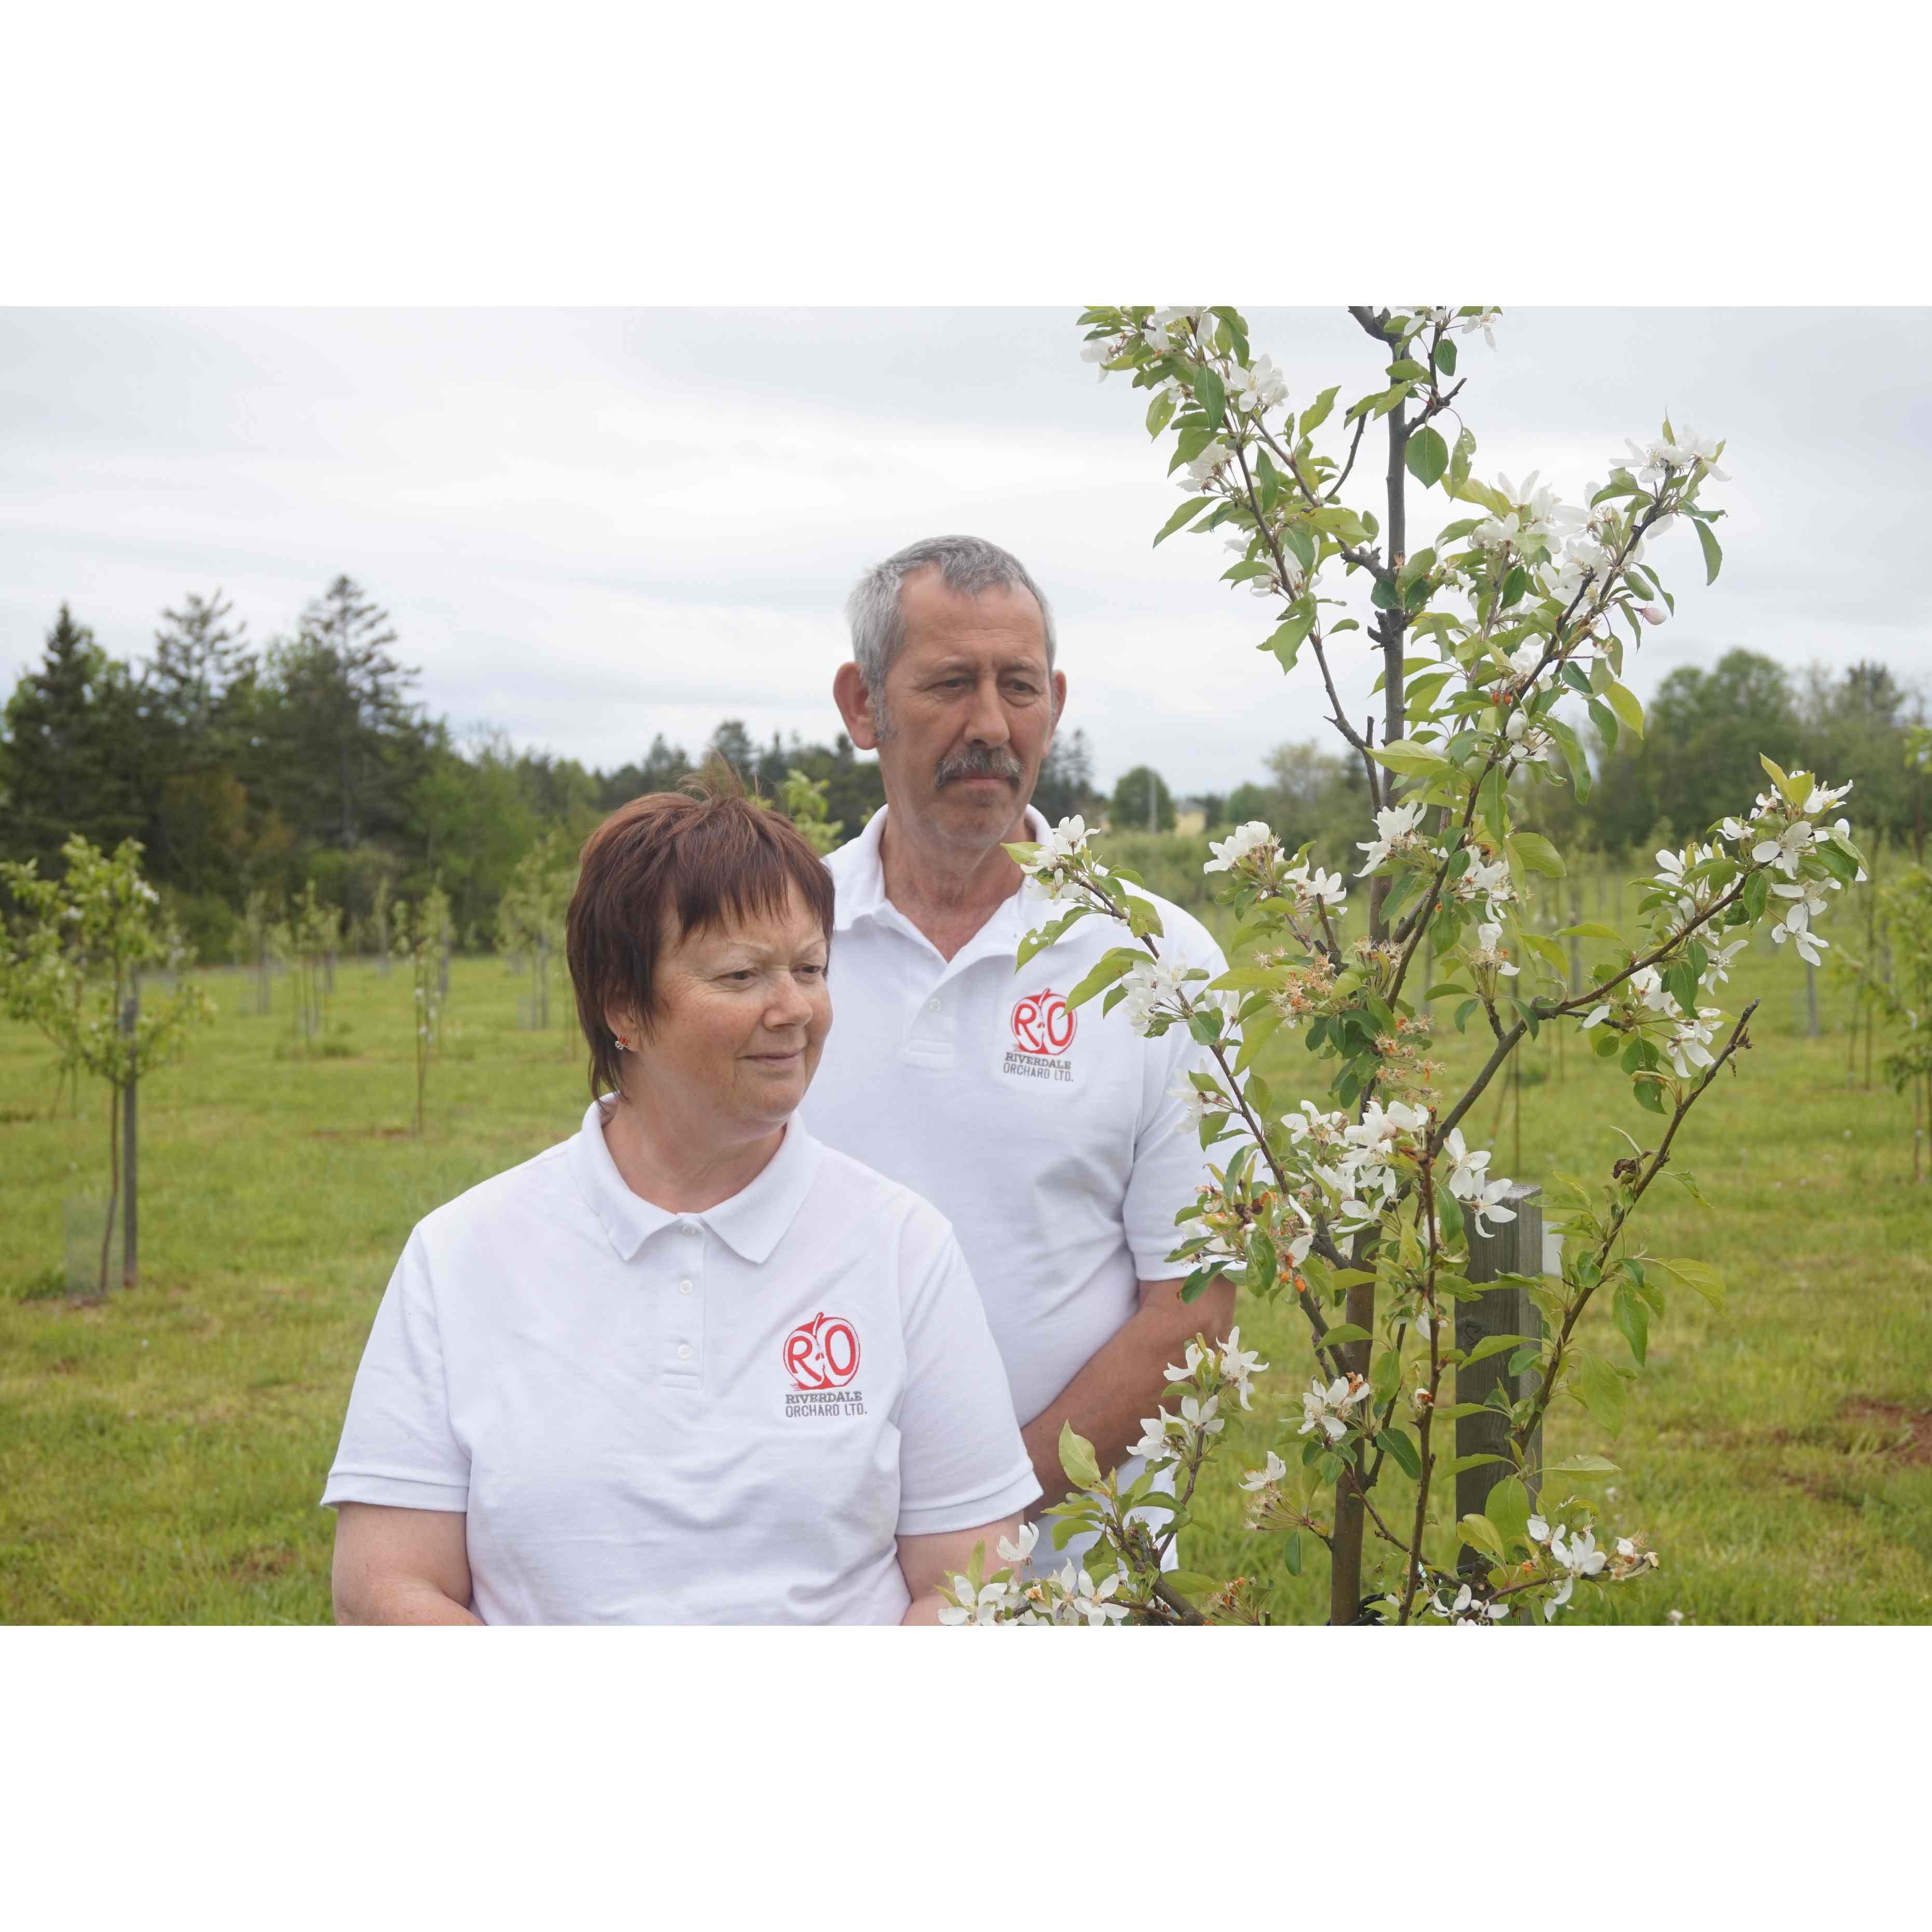 Riverdale Orchard Ltd